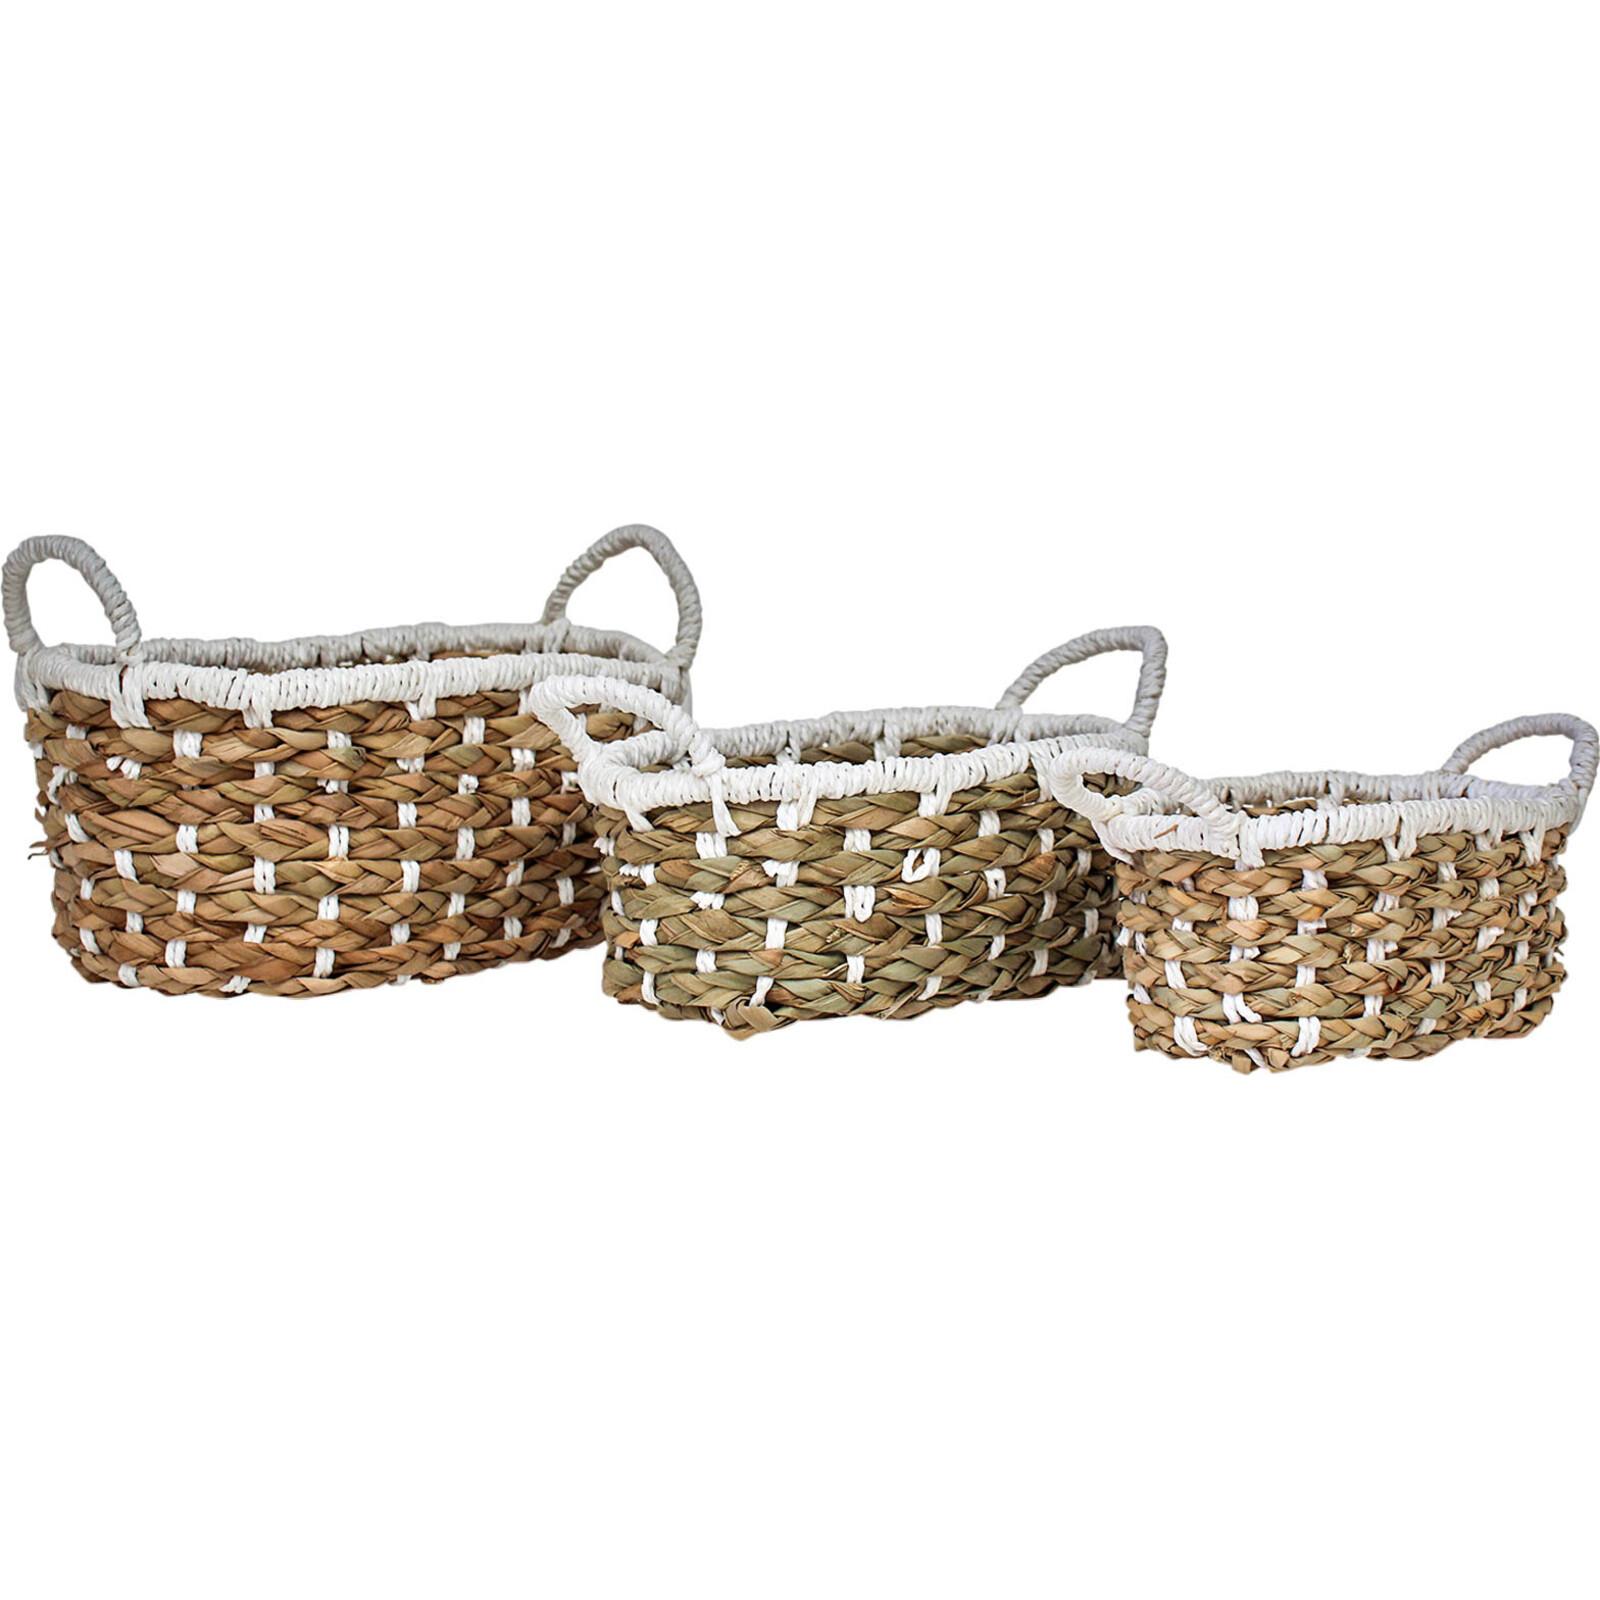 Woven Oval Storage Tubs Nat/White S/2